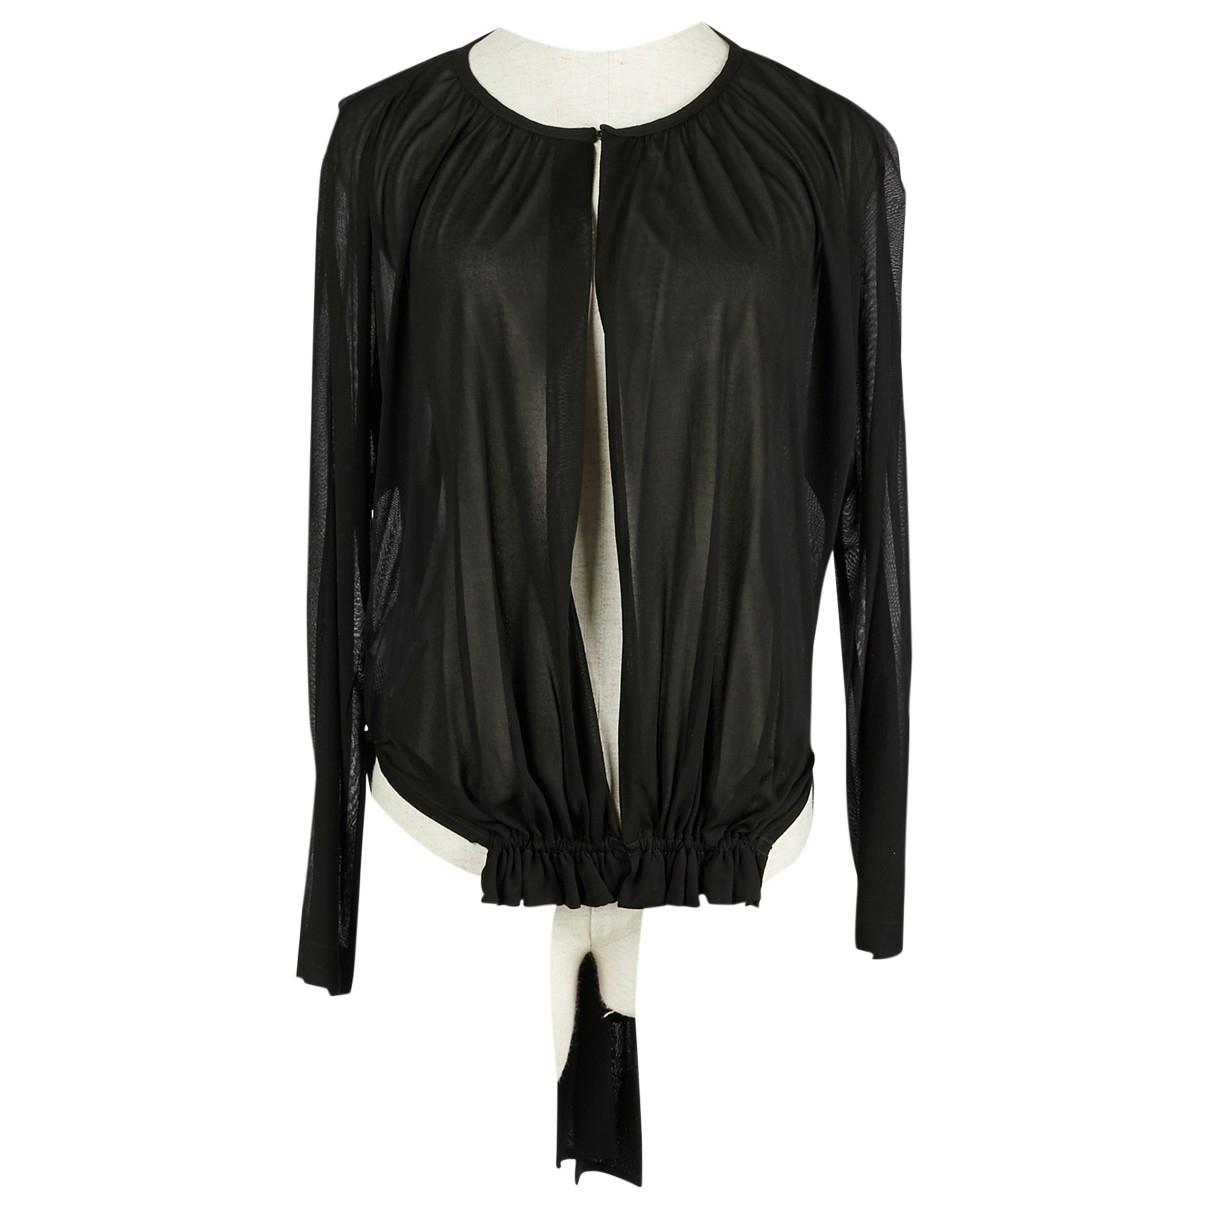 Maison Martin Margiela \N Black jacket for Women 42 IT